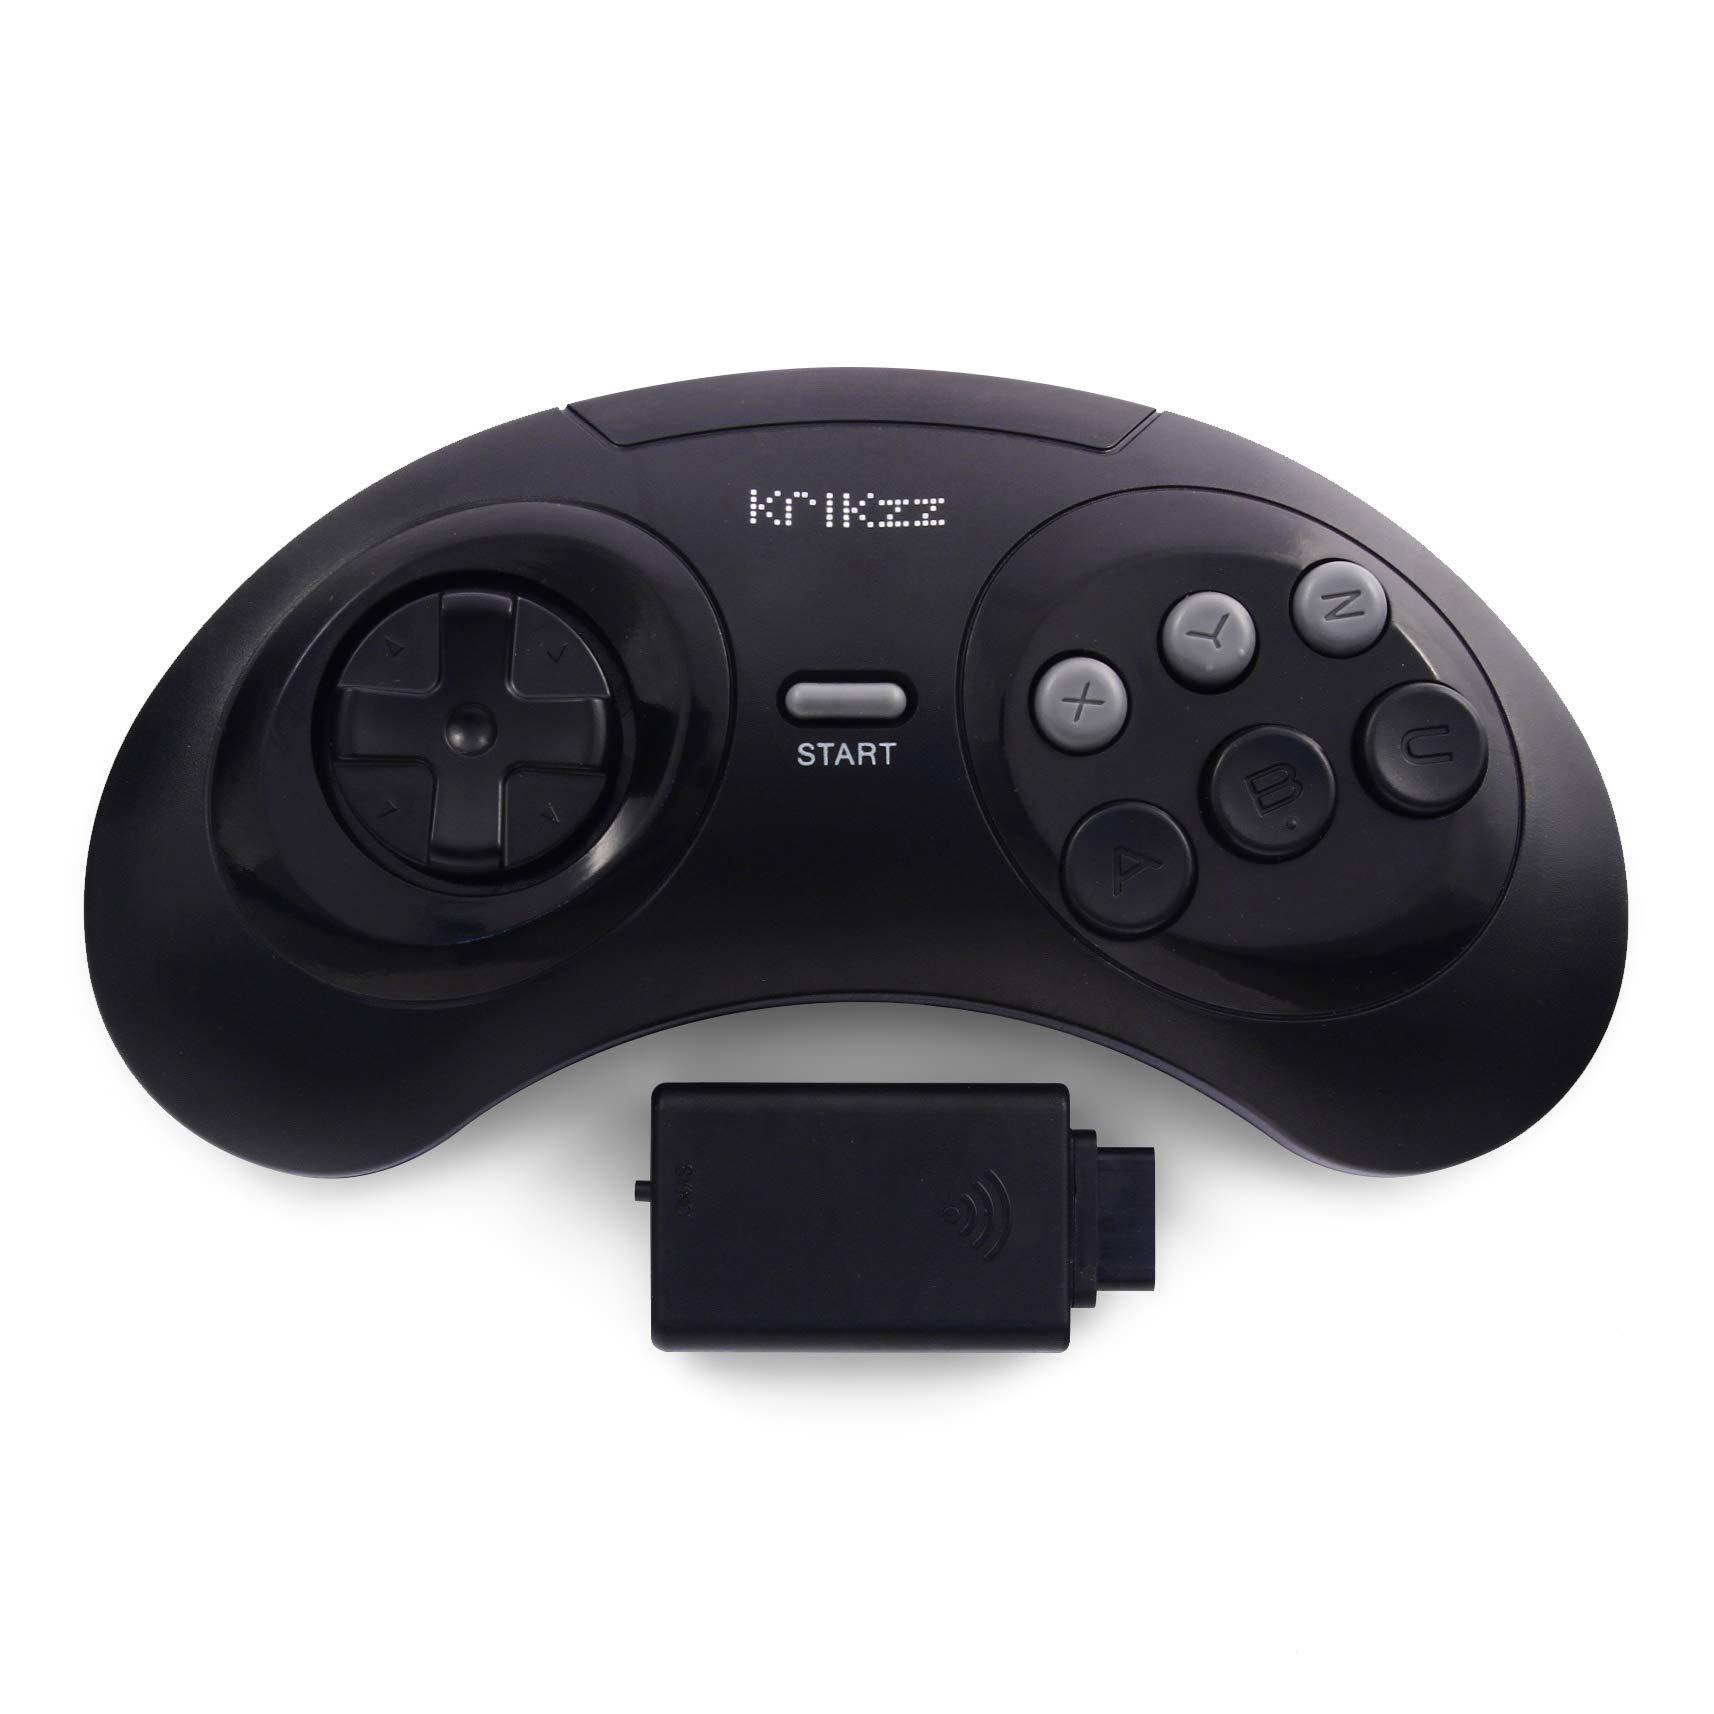 Joyzz Wireless Controller Gamepad for Original SEGA Genesis, Megadrive